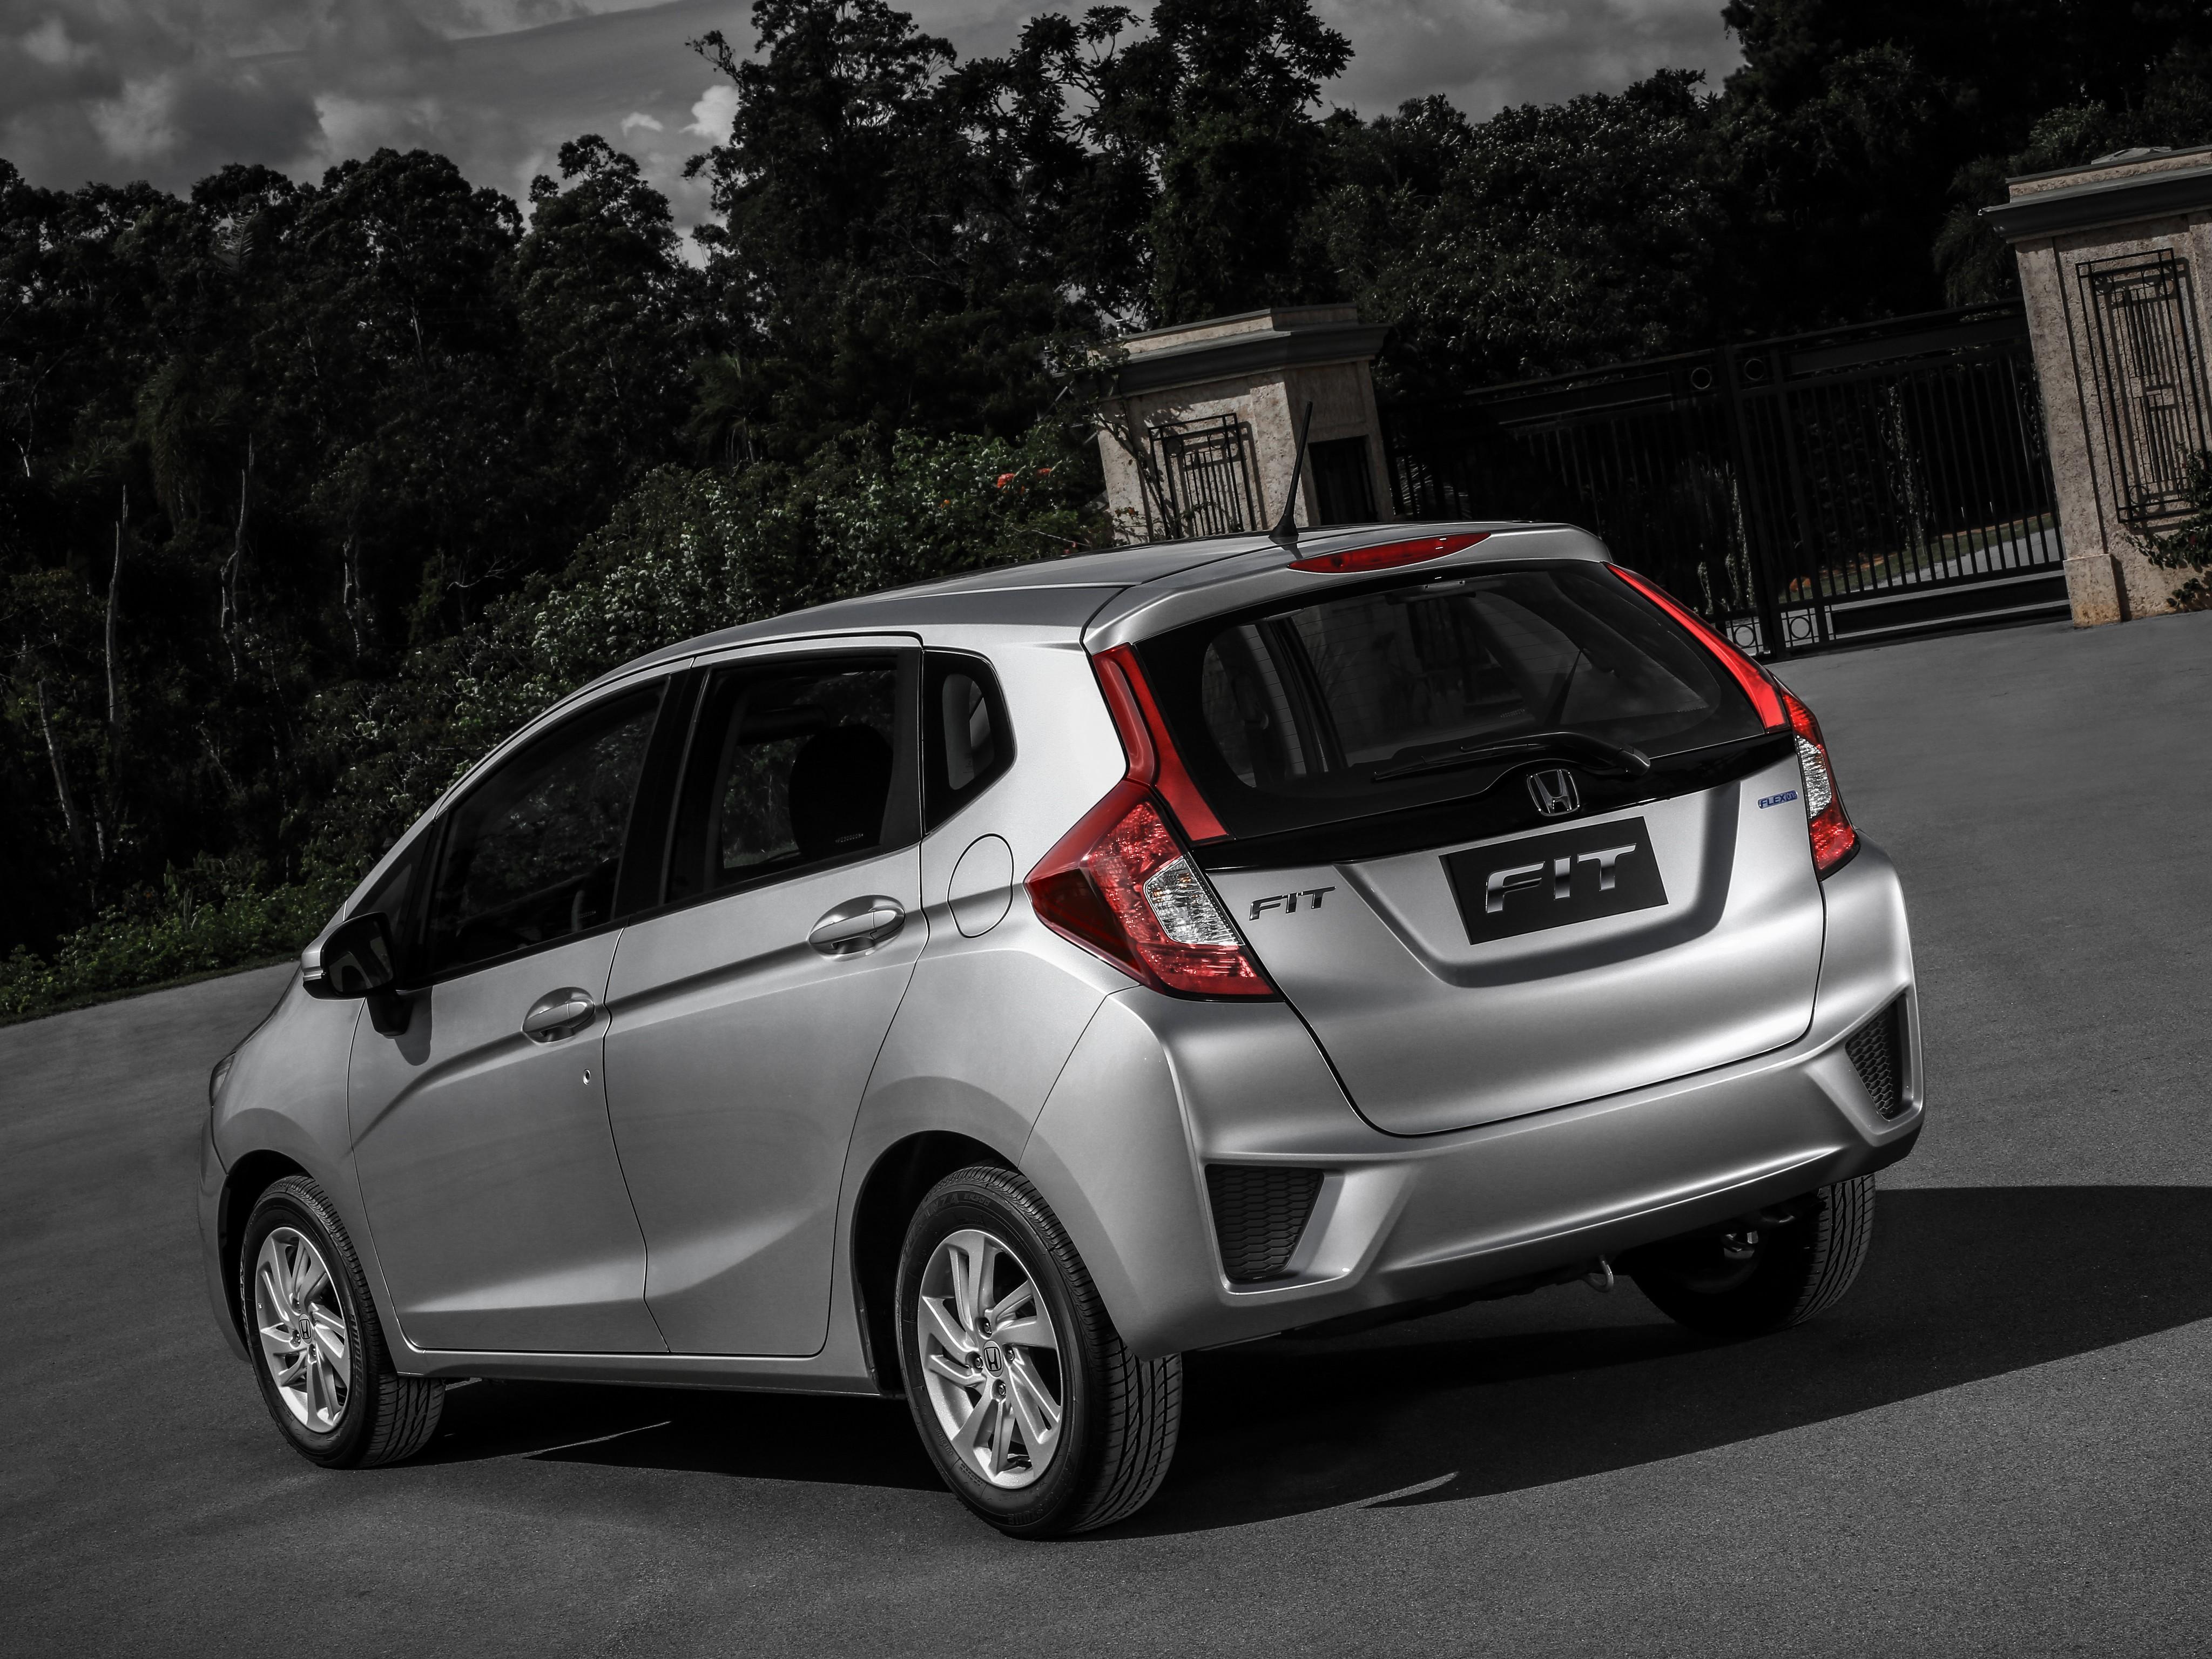 Honda jazz fit specs 2013 2014 2015 2016 2017 for Honda fit hp